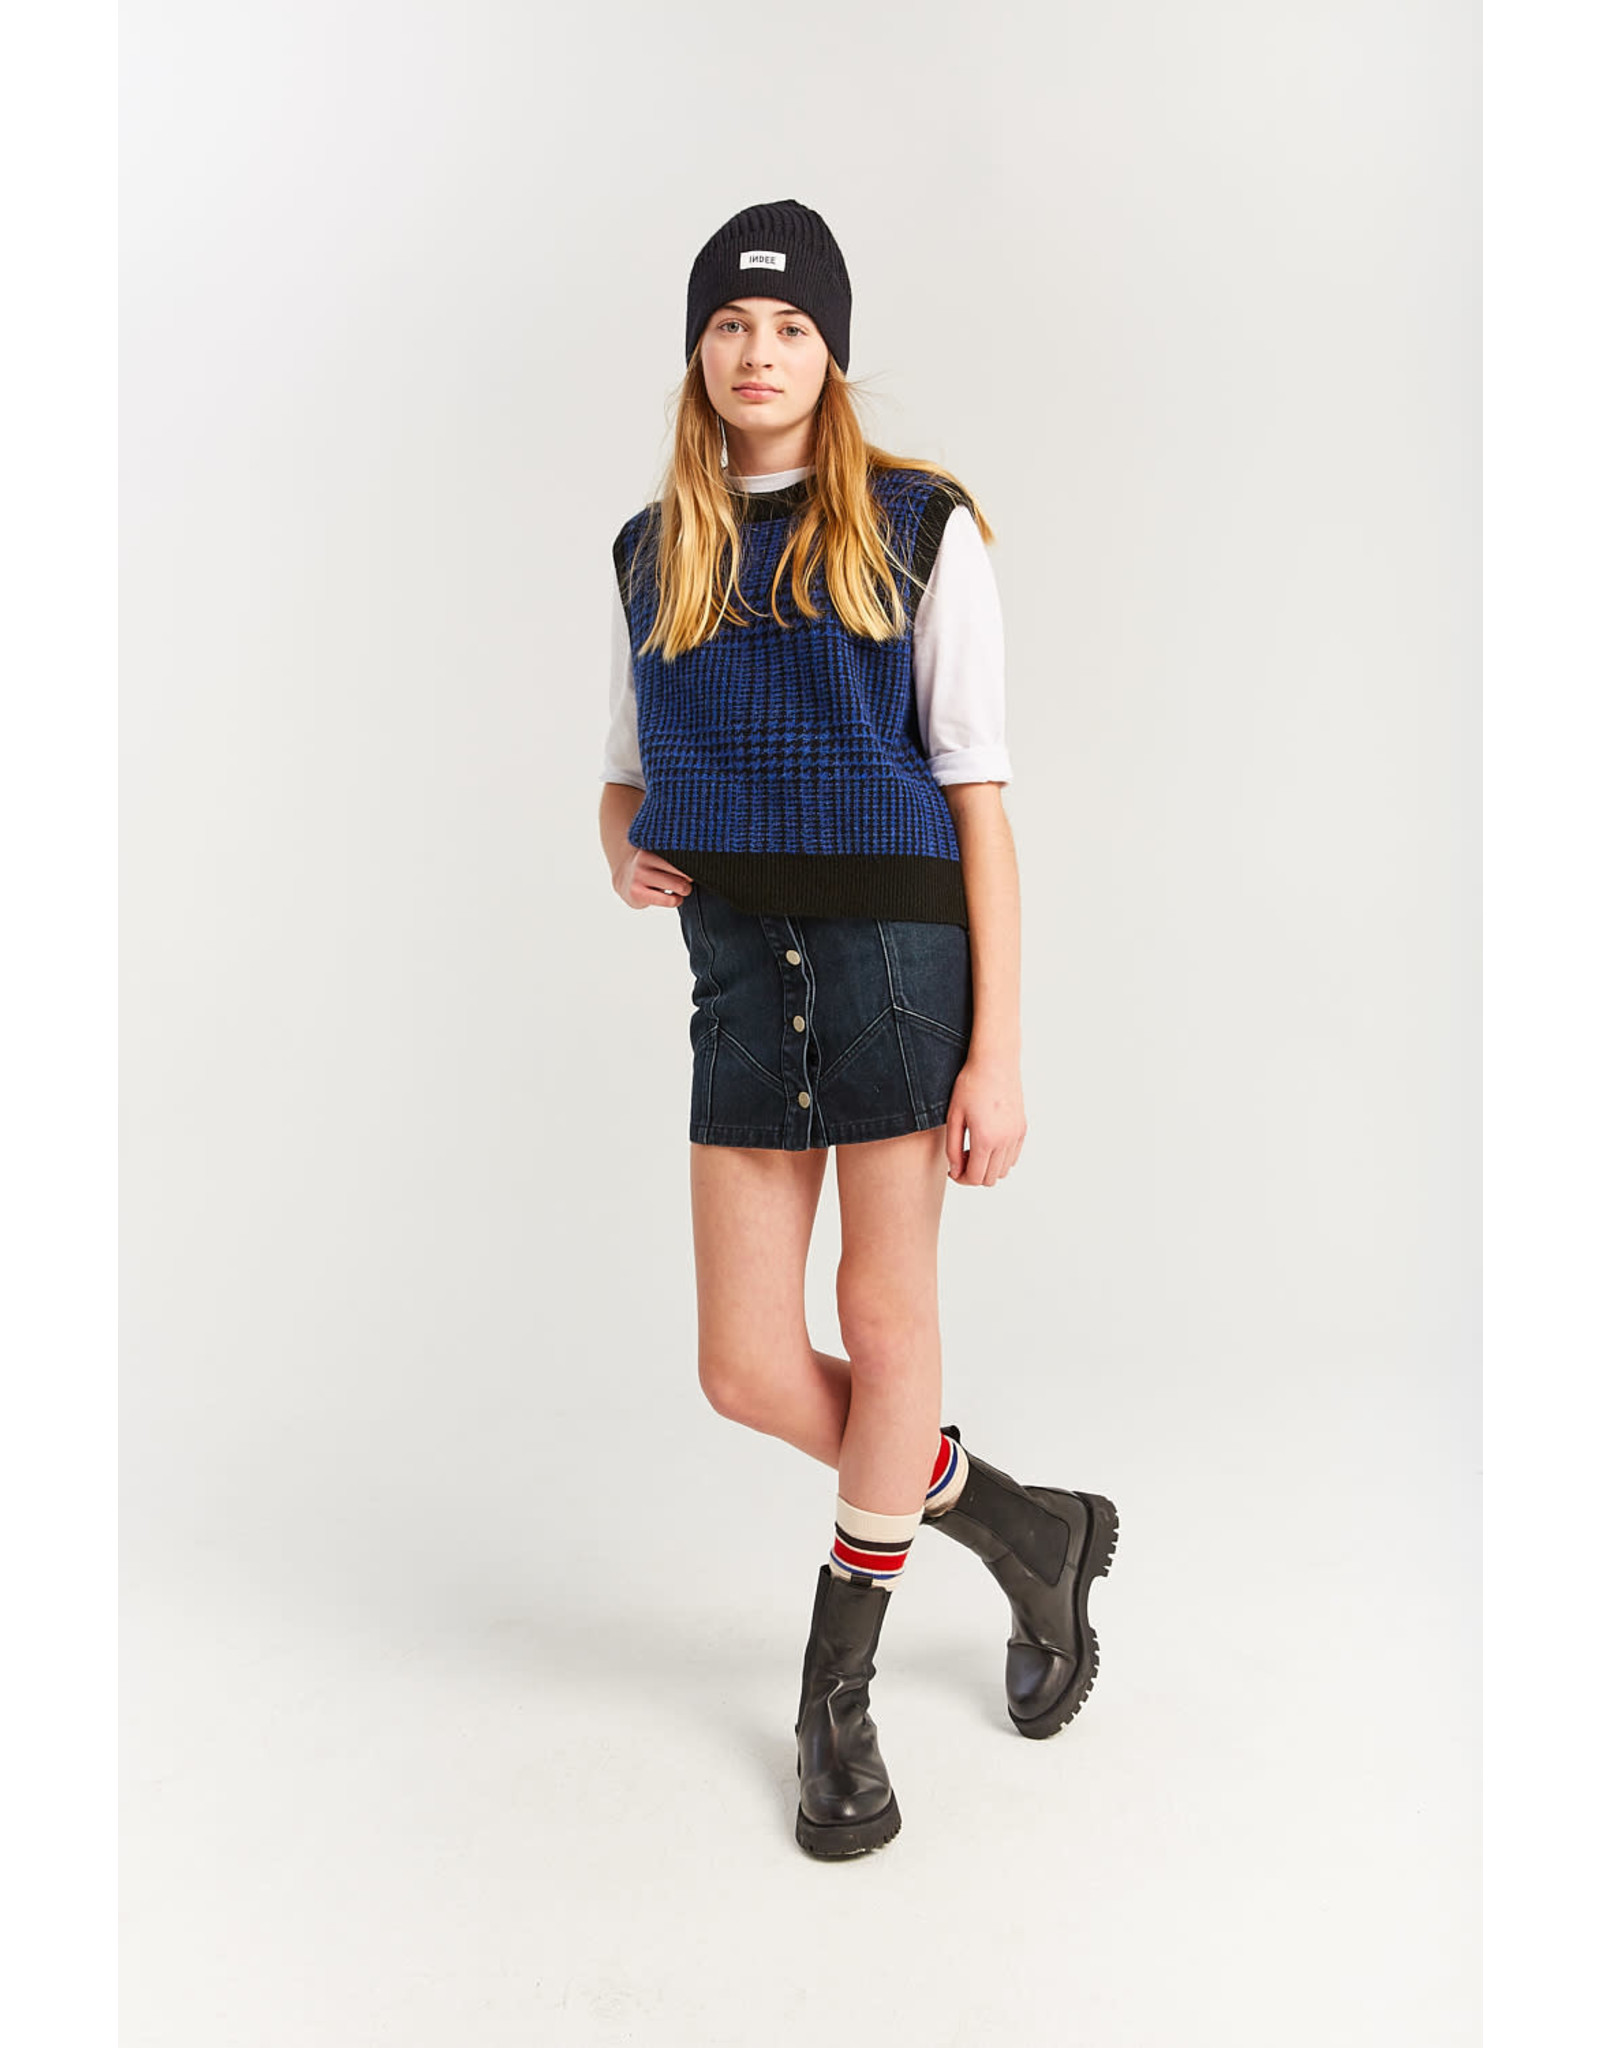 INDEE FW21 Kristina sleeveless sweater royal blue